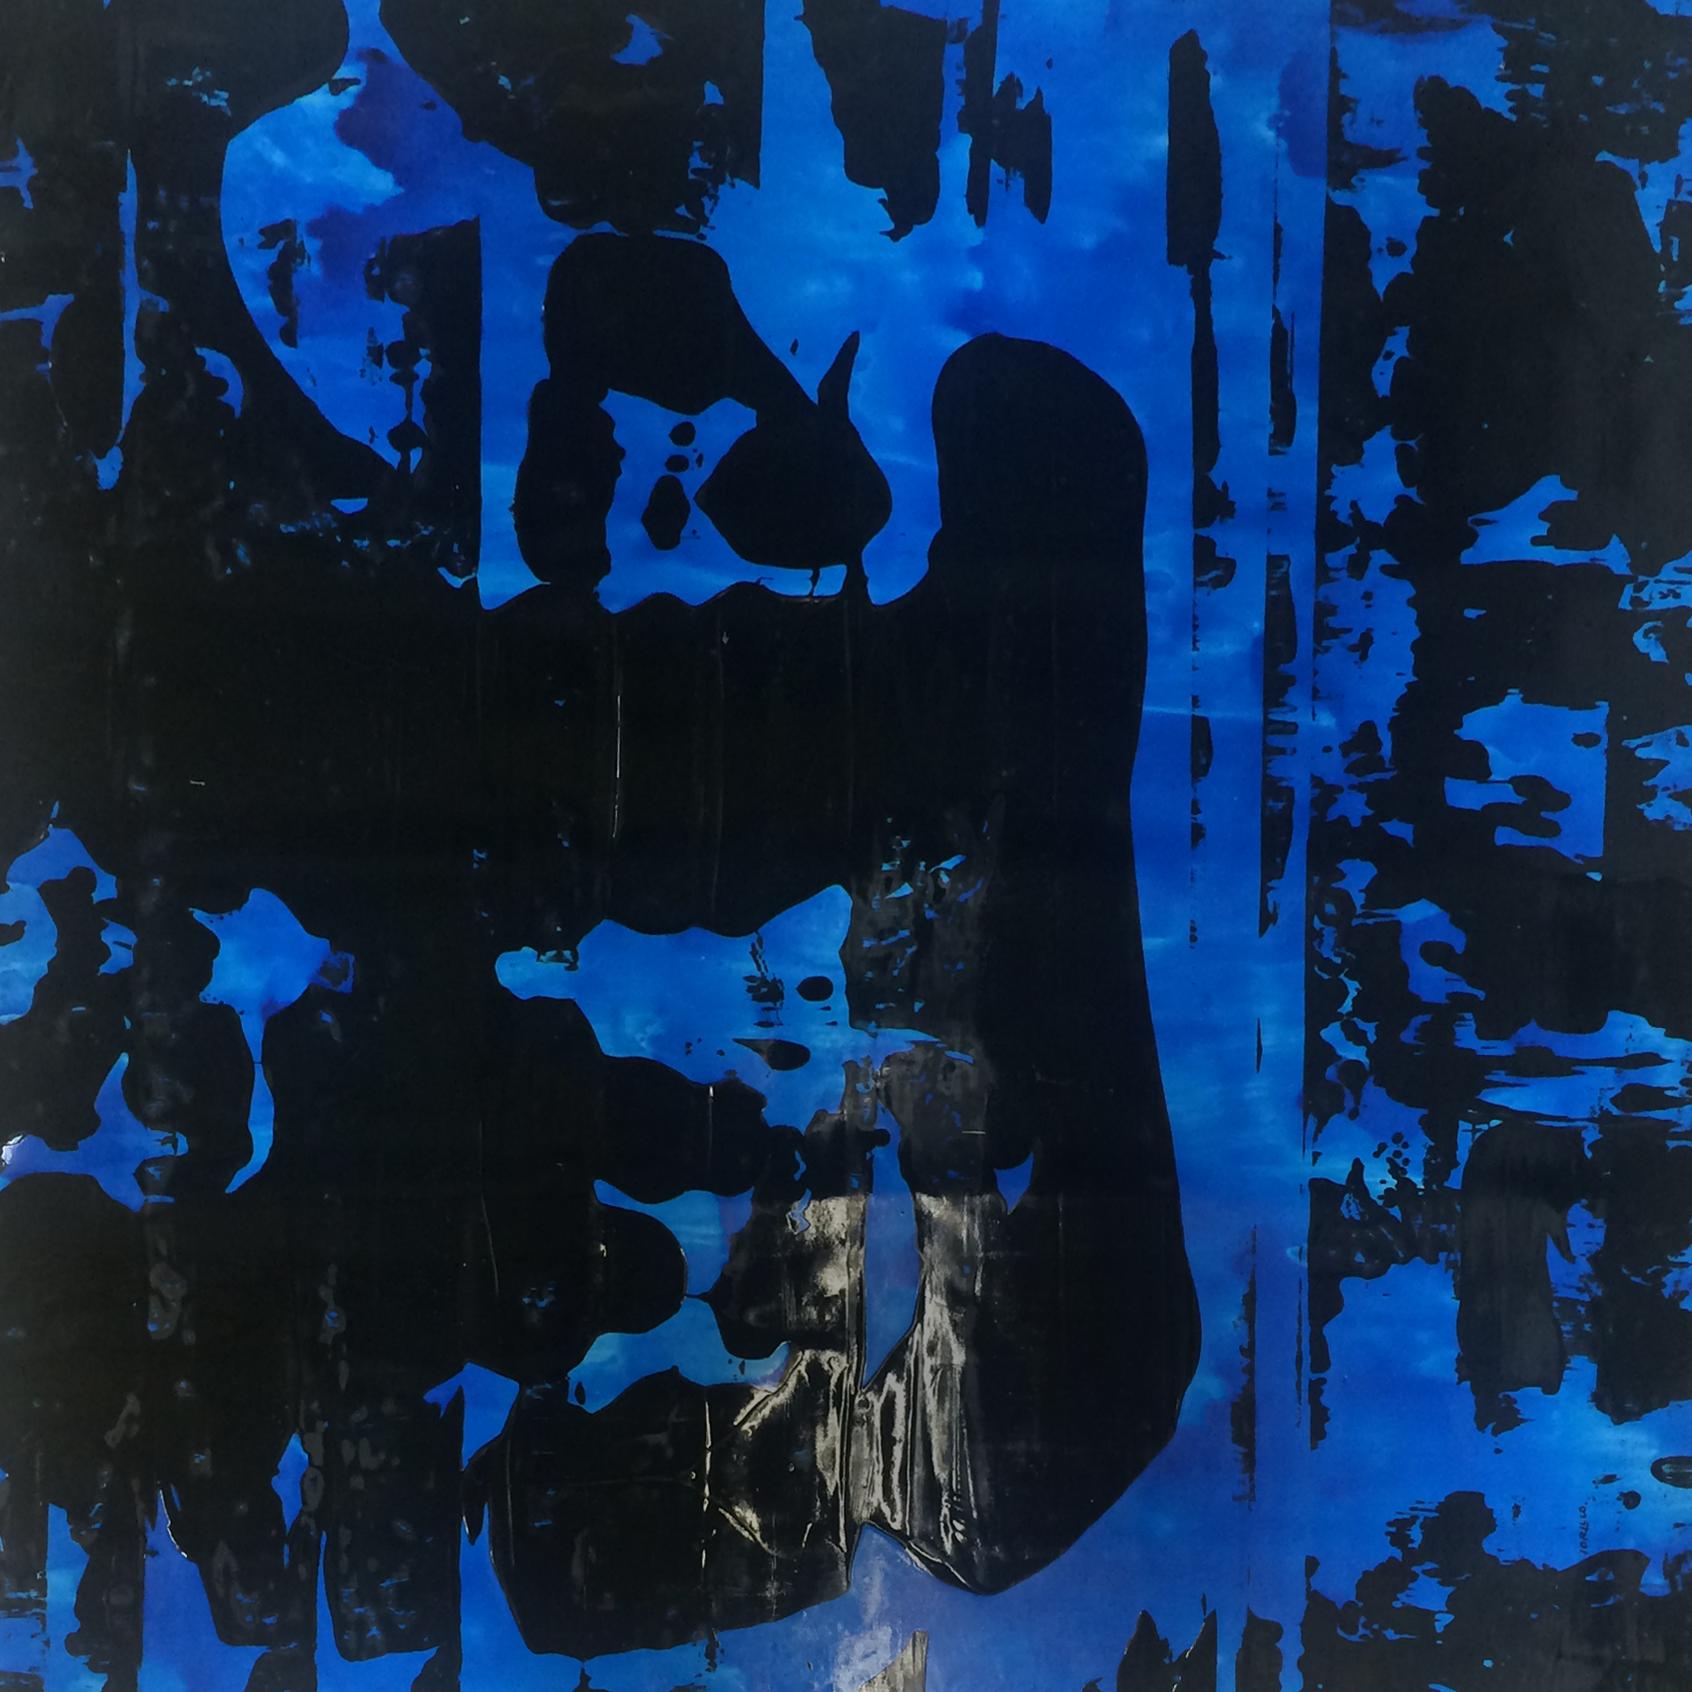 Iorillo - Blue Black Lava 50x50 - AEJIC13.3.png